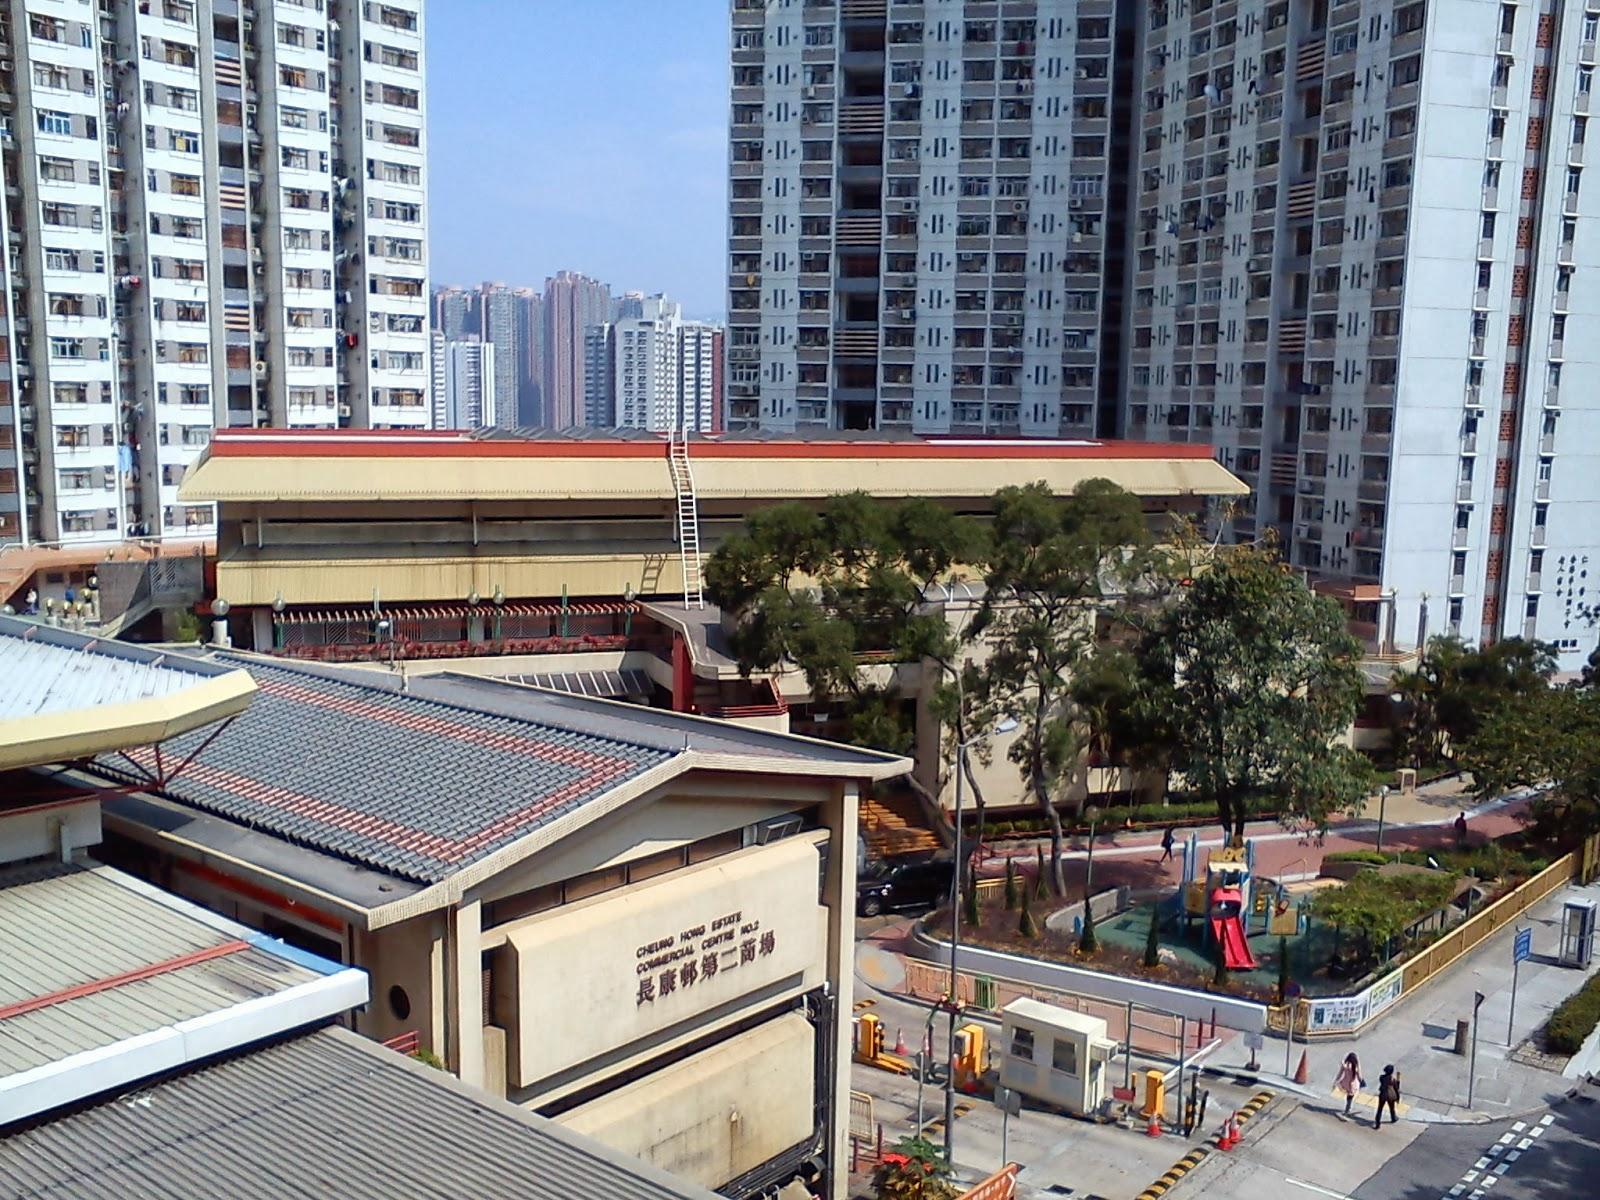 Grassroots O2: [領匯商場] 青華苑商舖 @2013-02-23